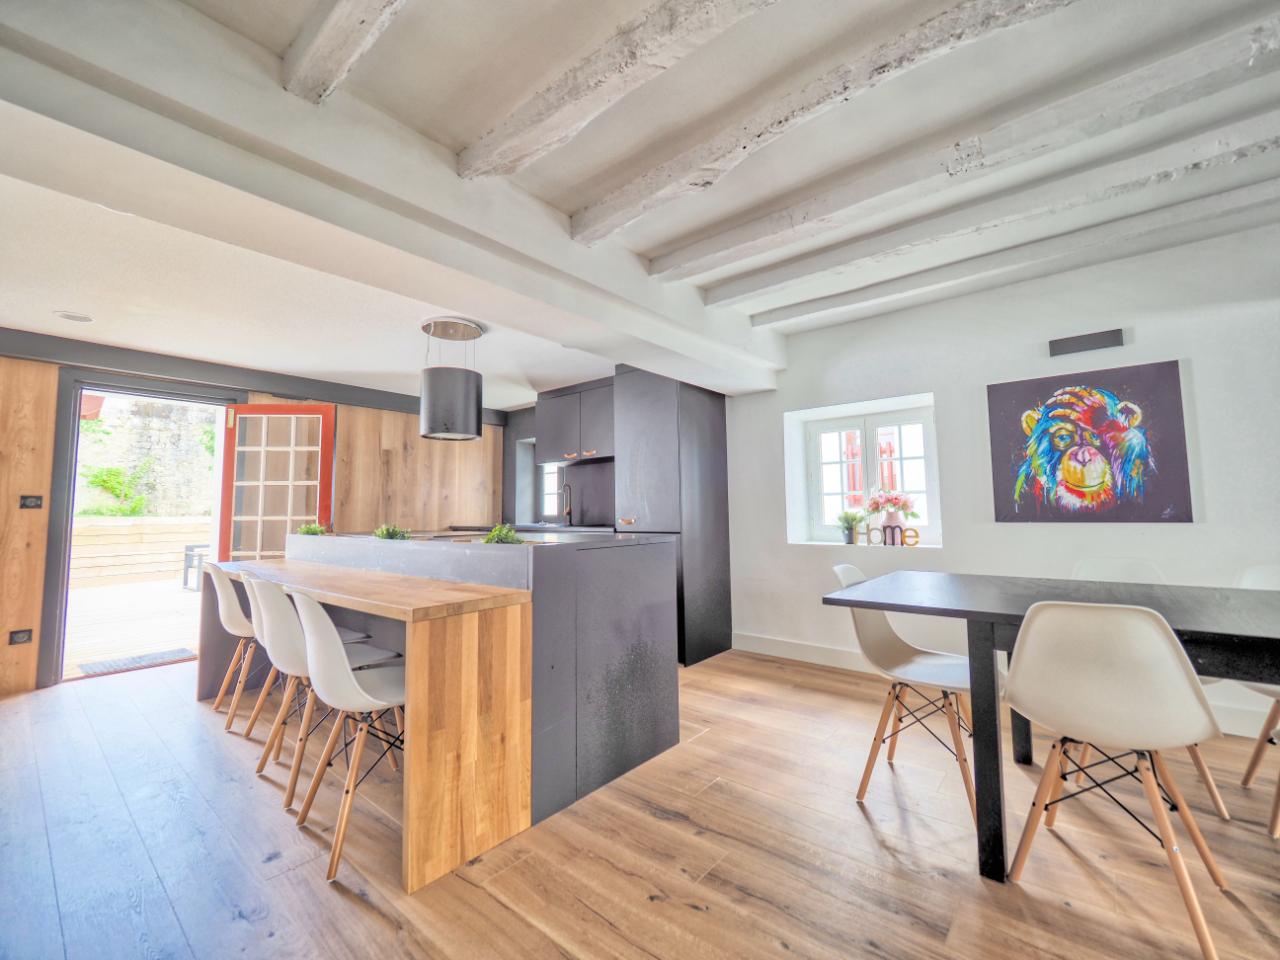 vente maison à URRUGNE - 645 000